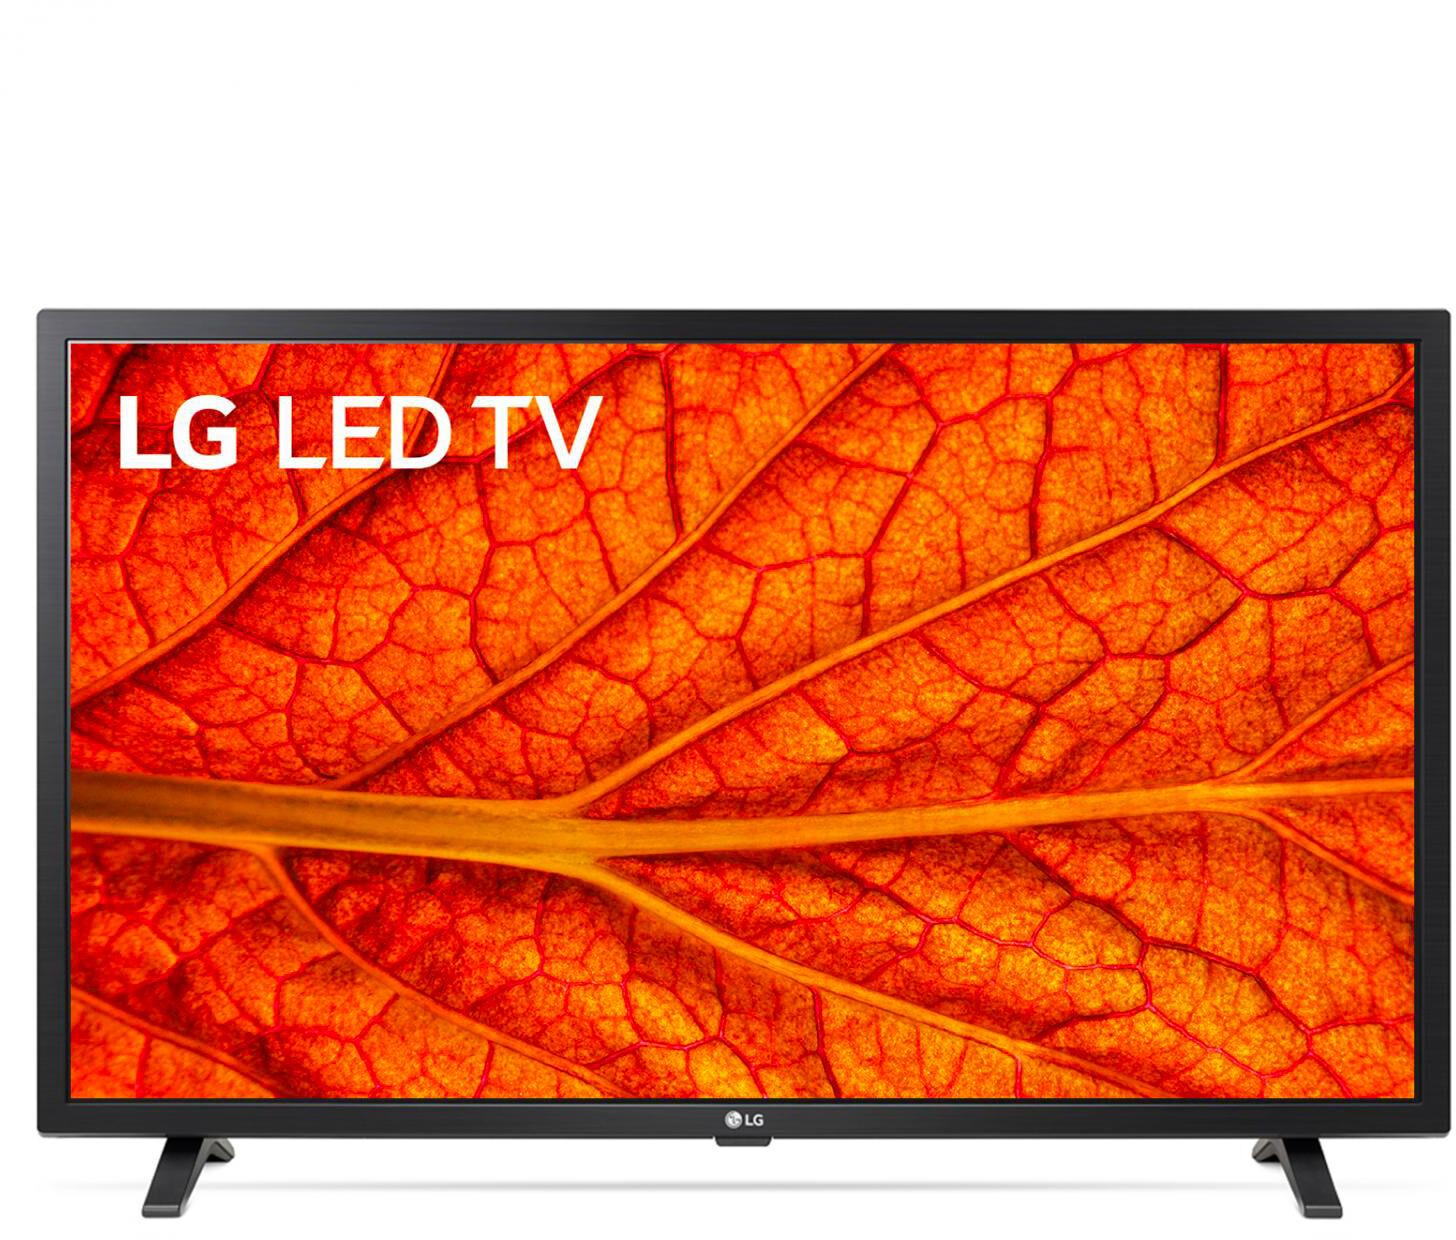 LG 32lm6370pla Smart Tv 32 Pollici Full Hd Televisore Led Display Led Dvb T2 /s2 Internet Tv Wifi Bluetooth 32lm6370pla